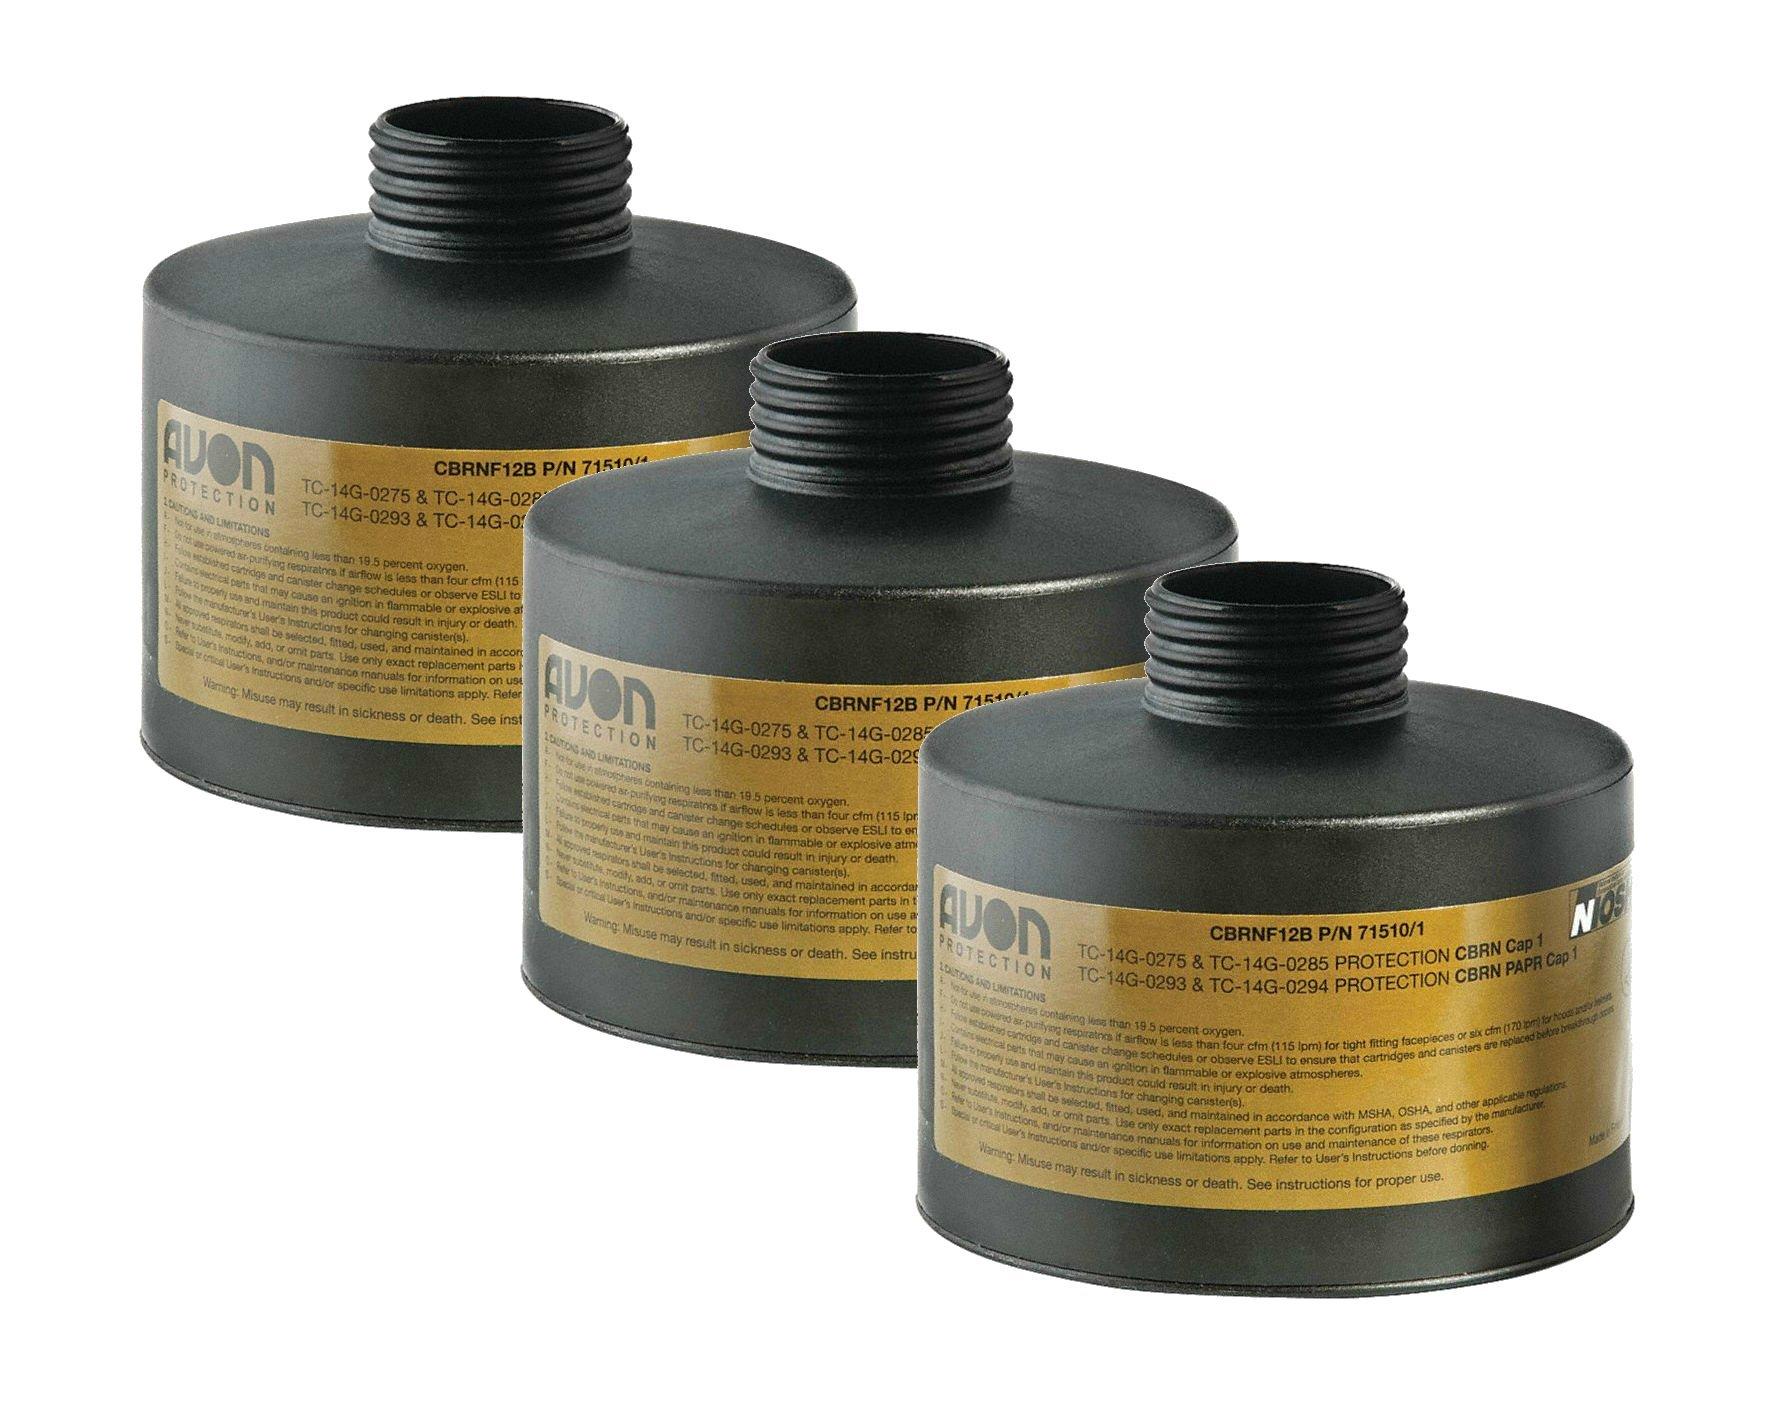 Filter, Gas Mask, Avon, CBRN FM12, Black, 3 Pack